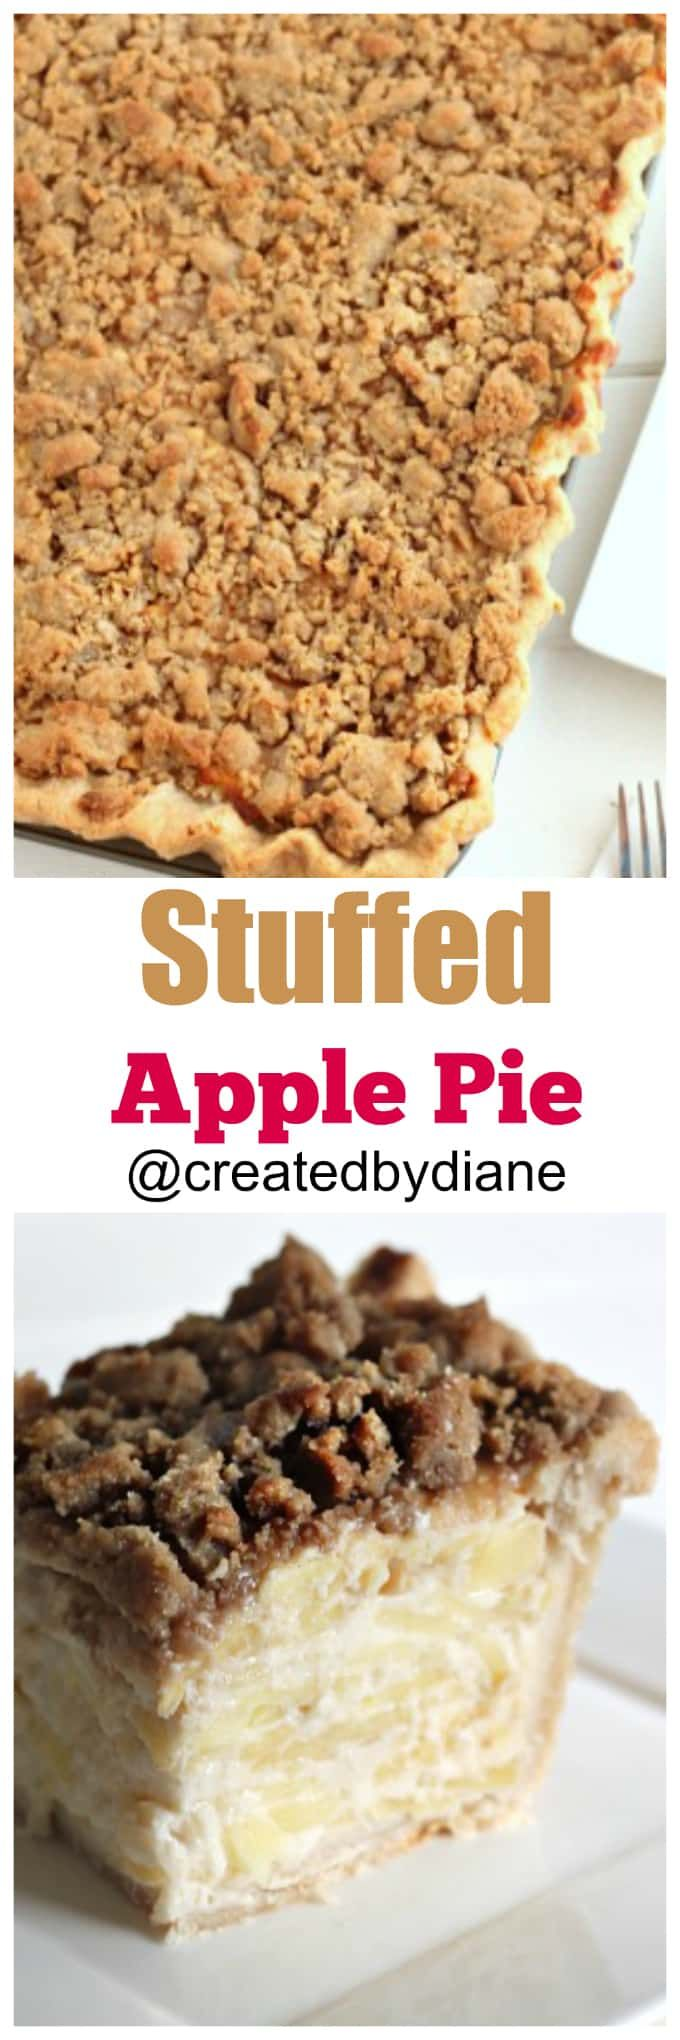 stuffed-apple-pie-recipe-from-createdbydiane